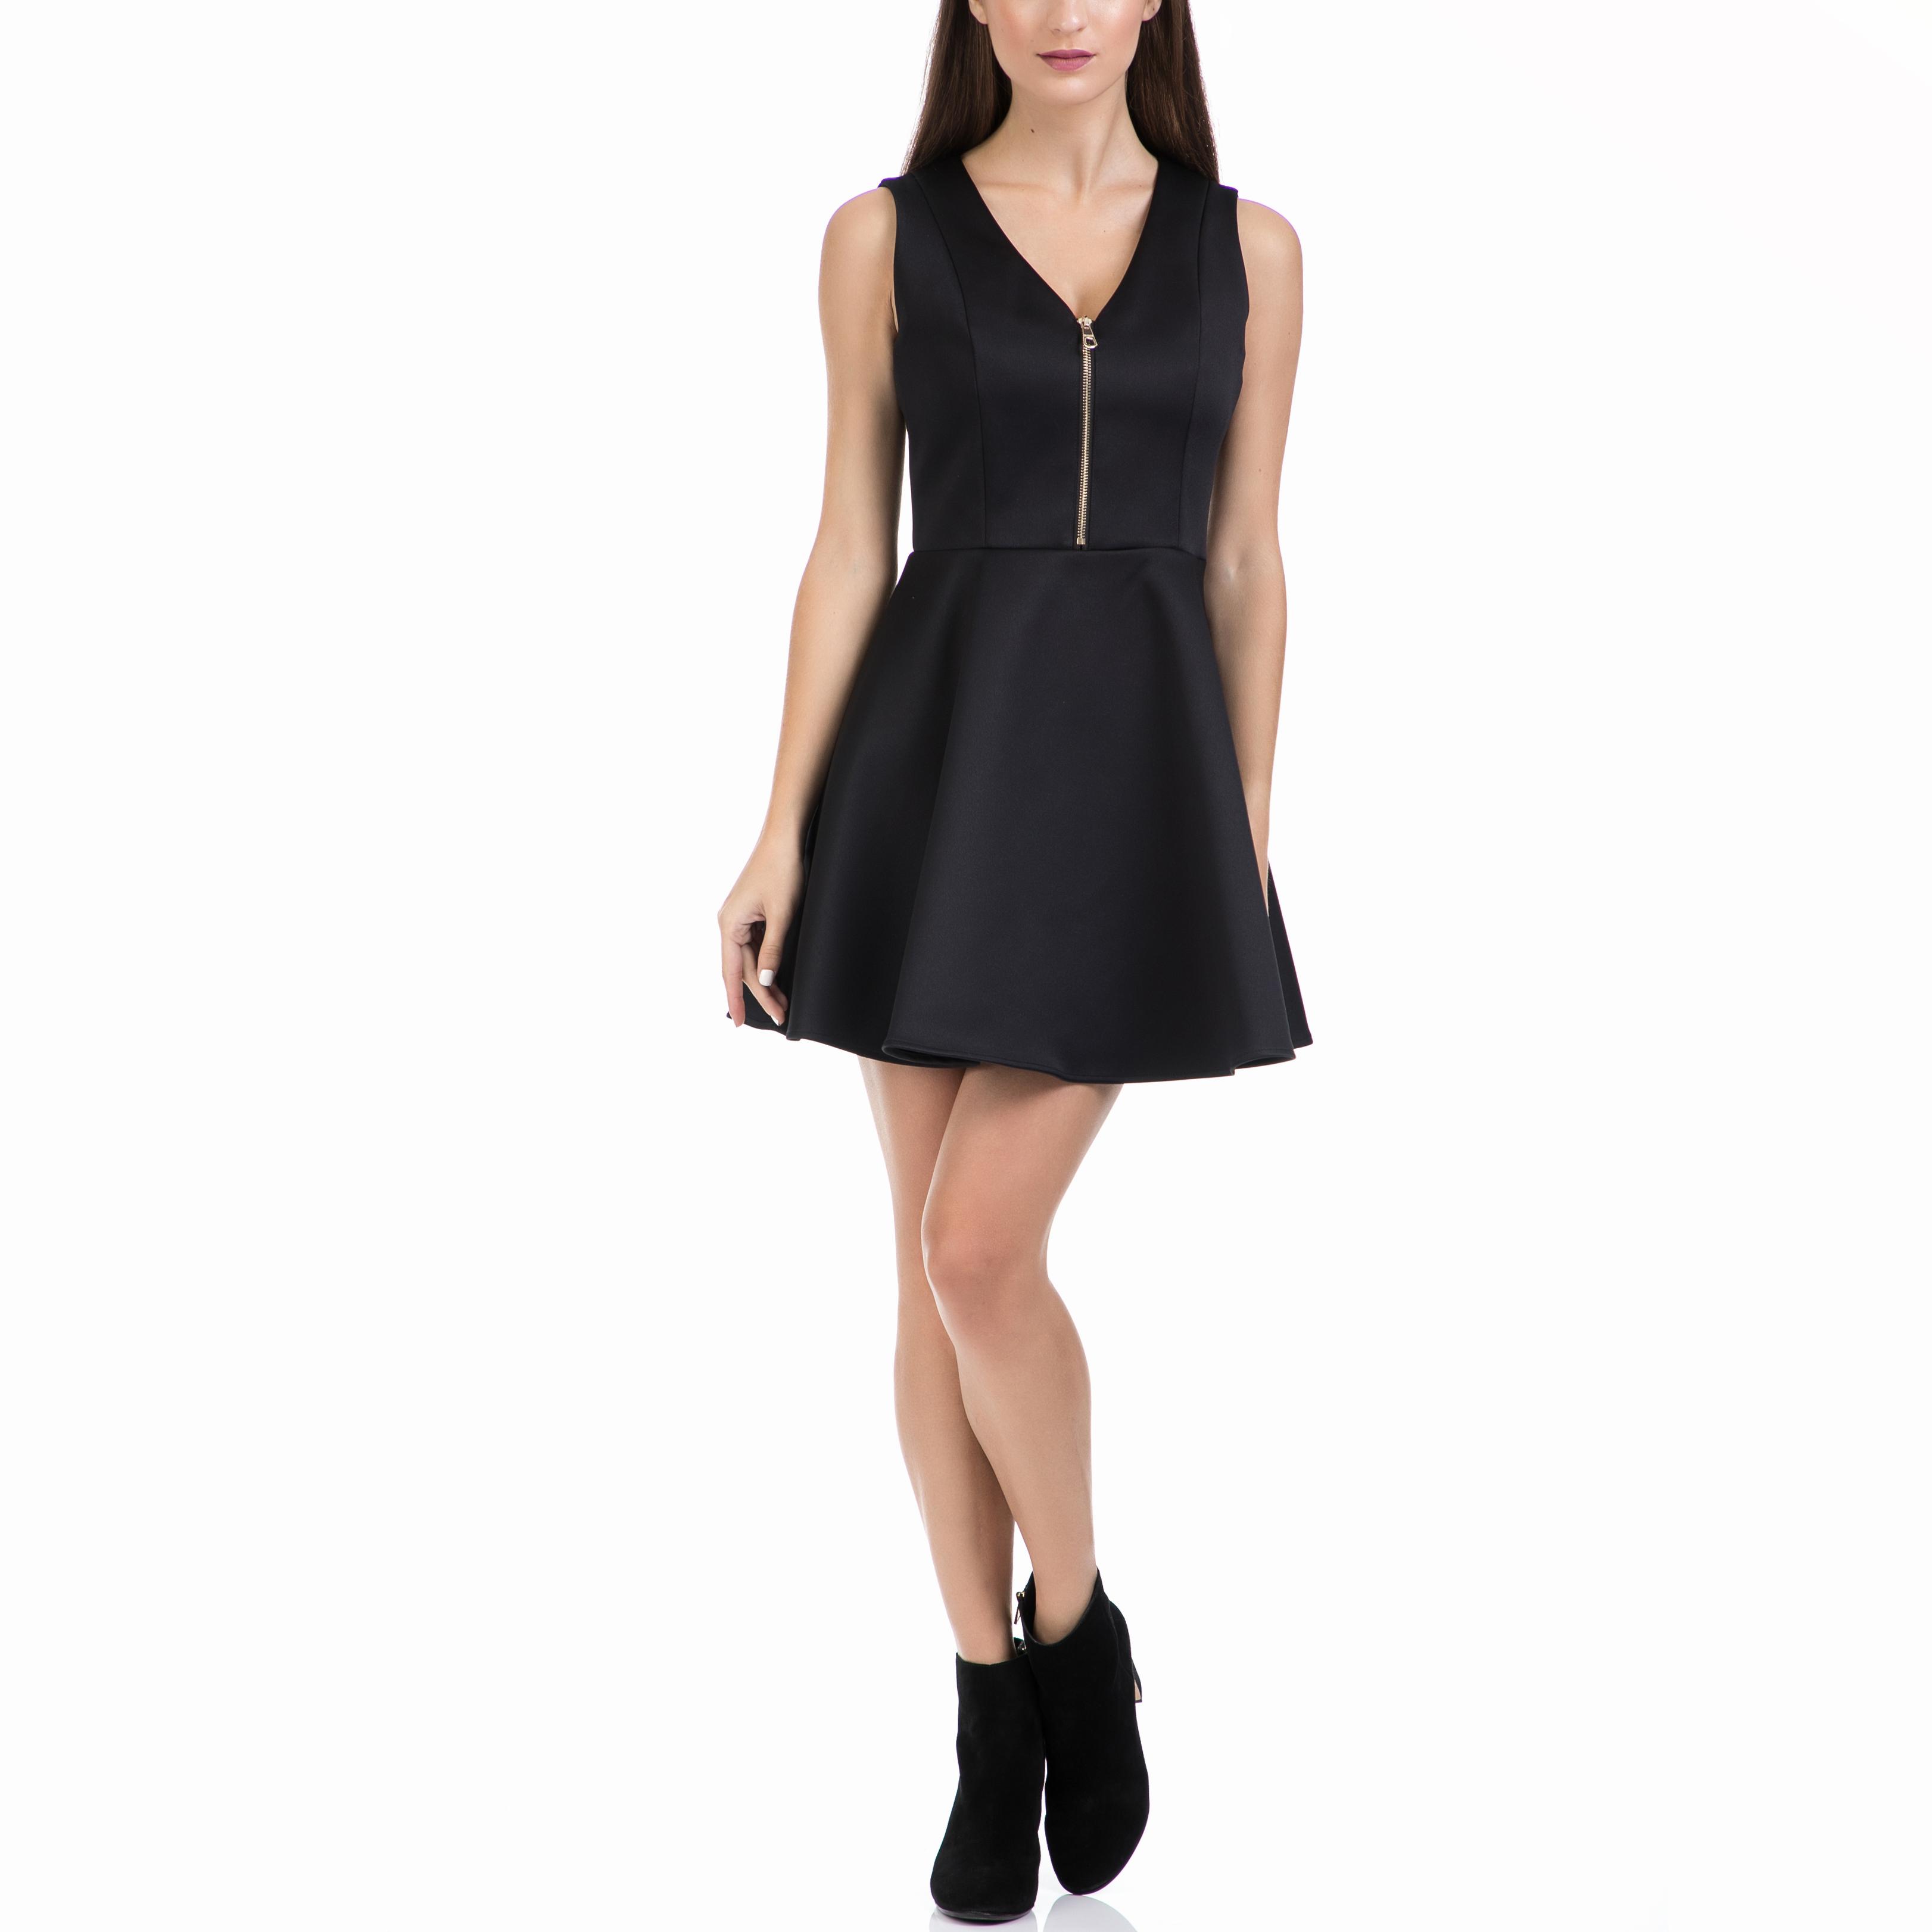 GUESS – Γυναικείο φόρεμα GUESS μαύρο